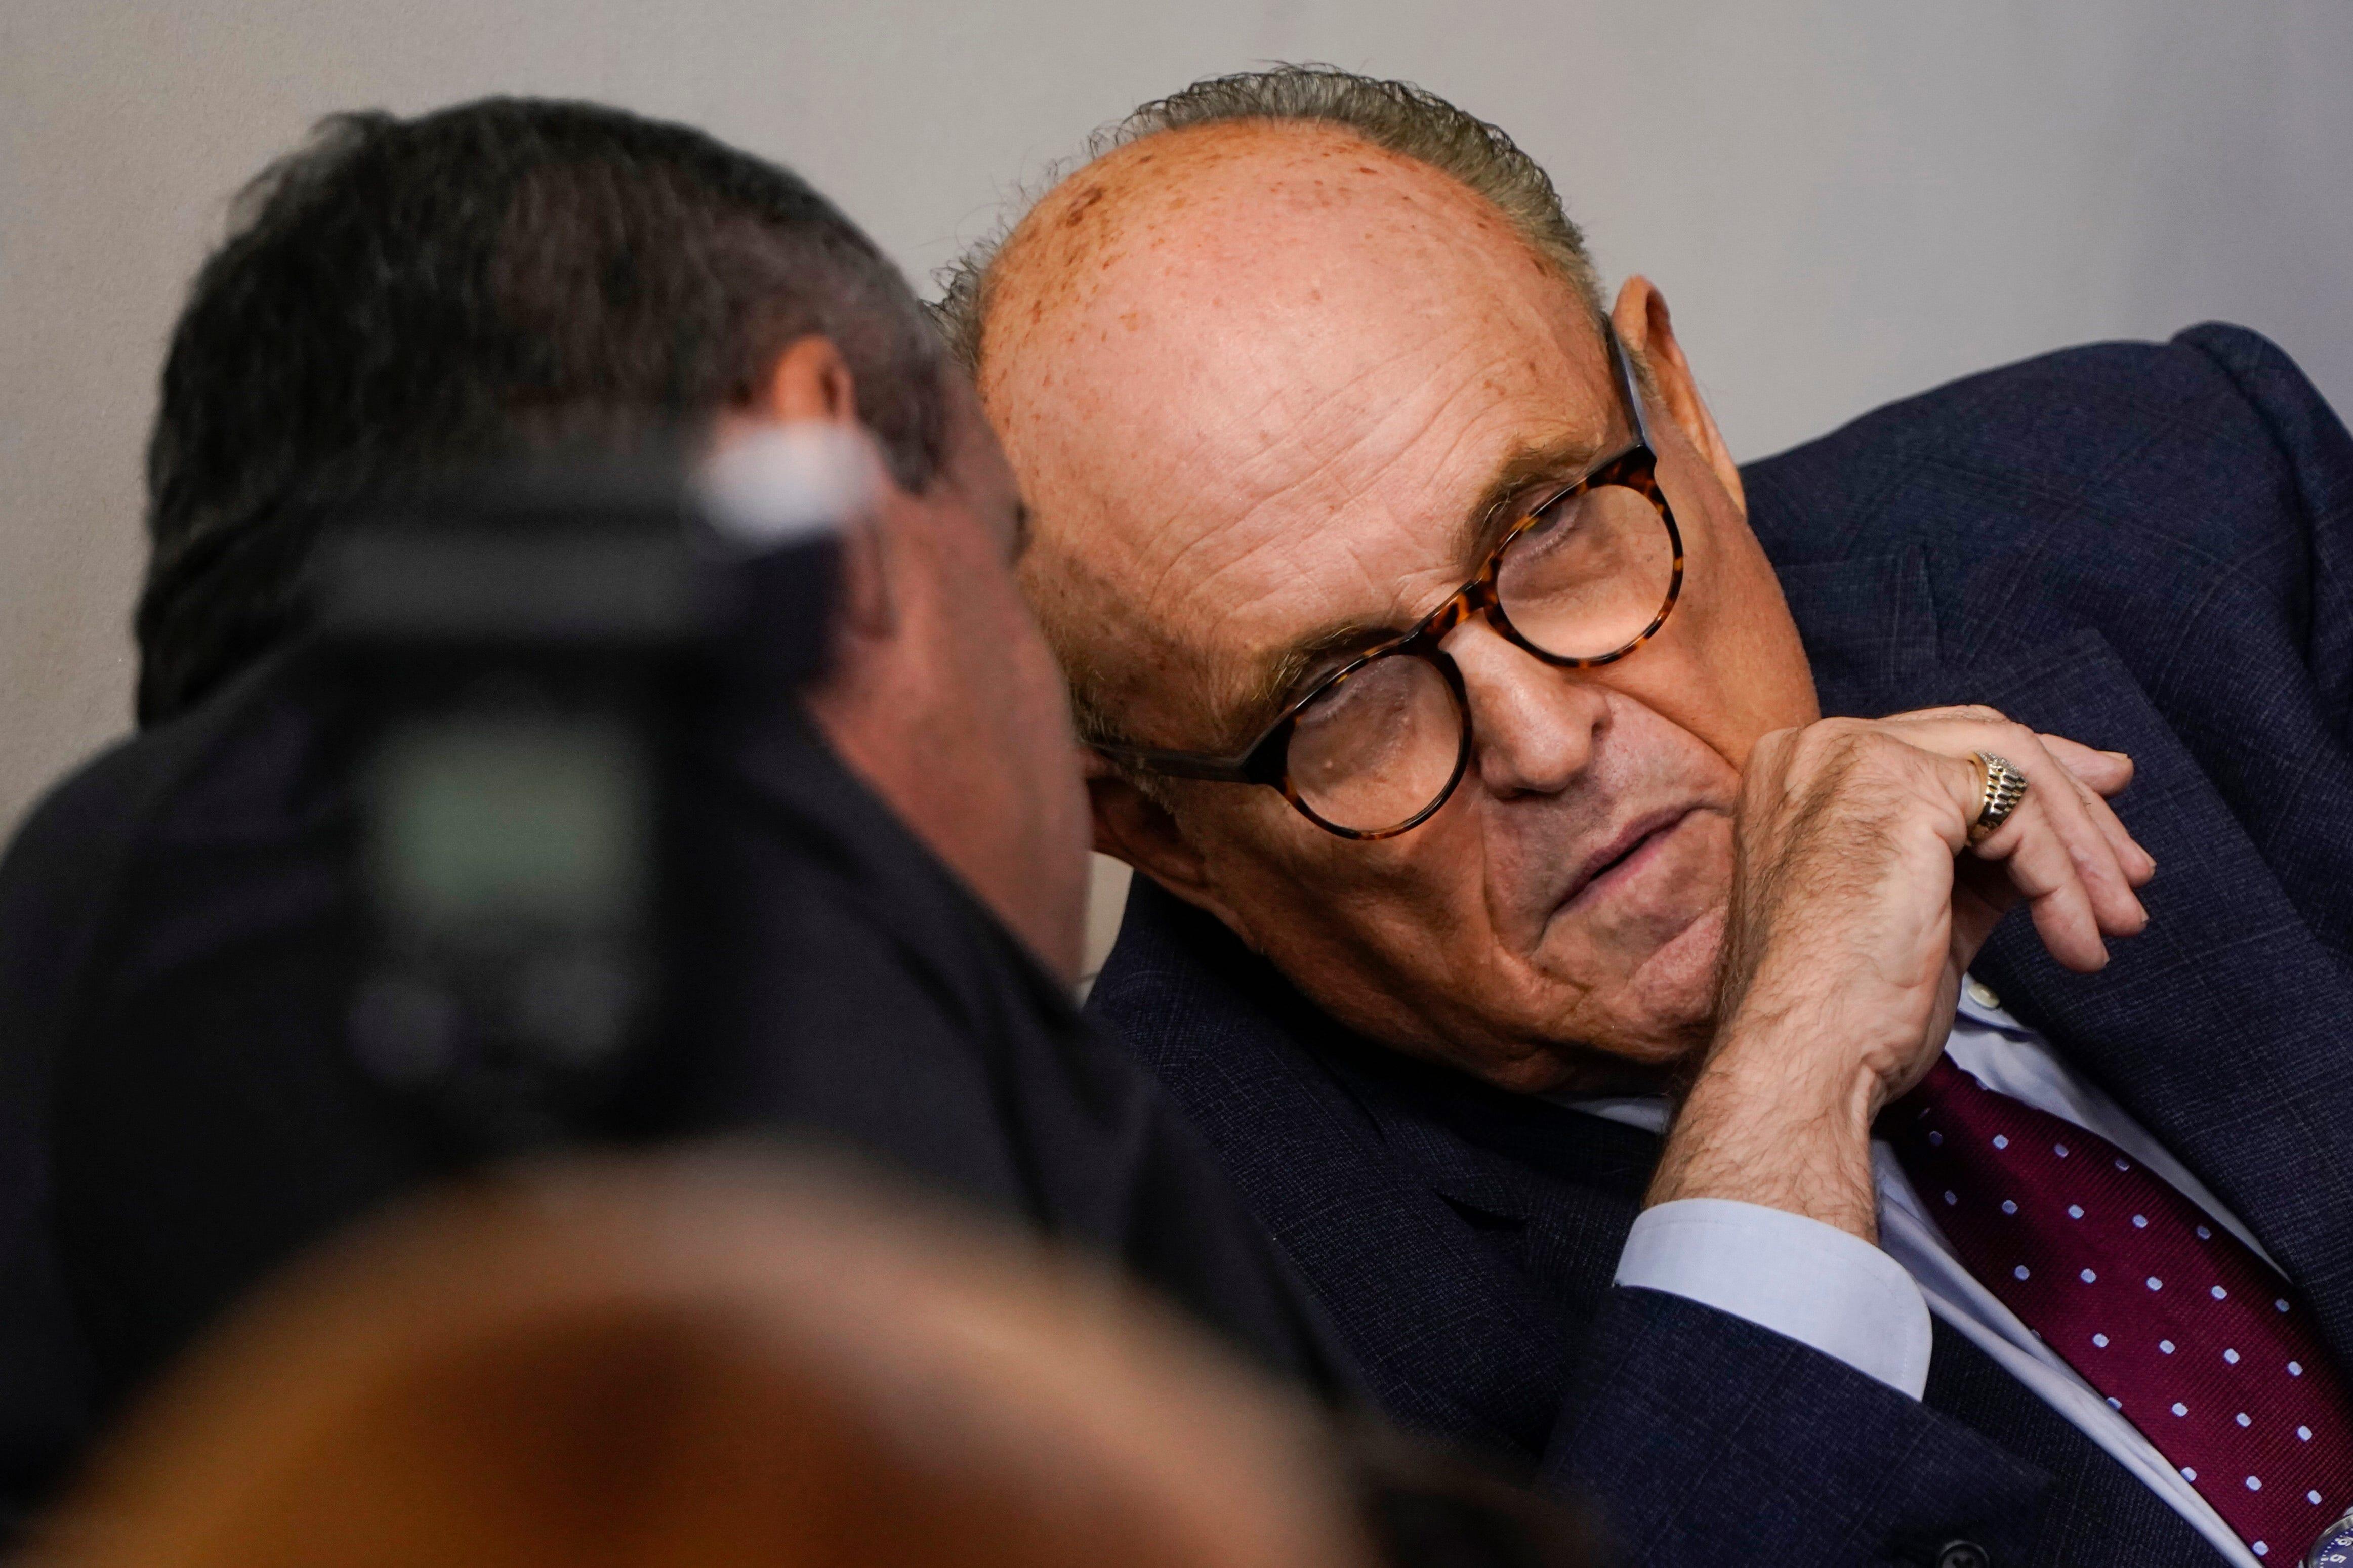 FBI probes possible Russia link in Biden data from Trump ally Giuliani